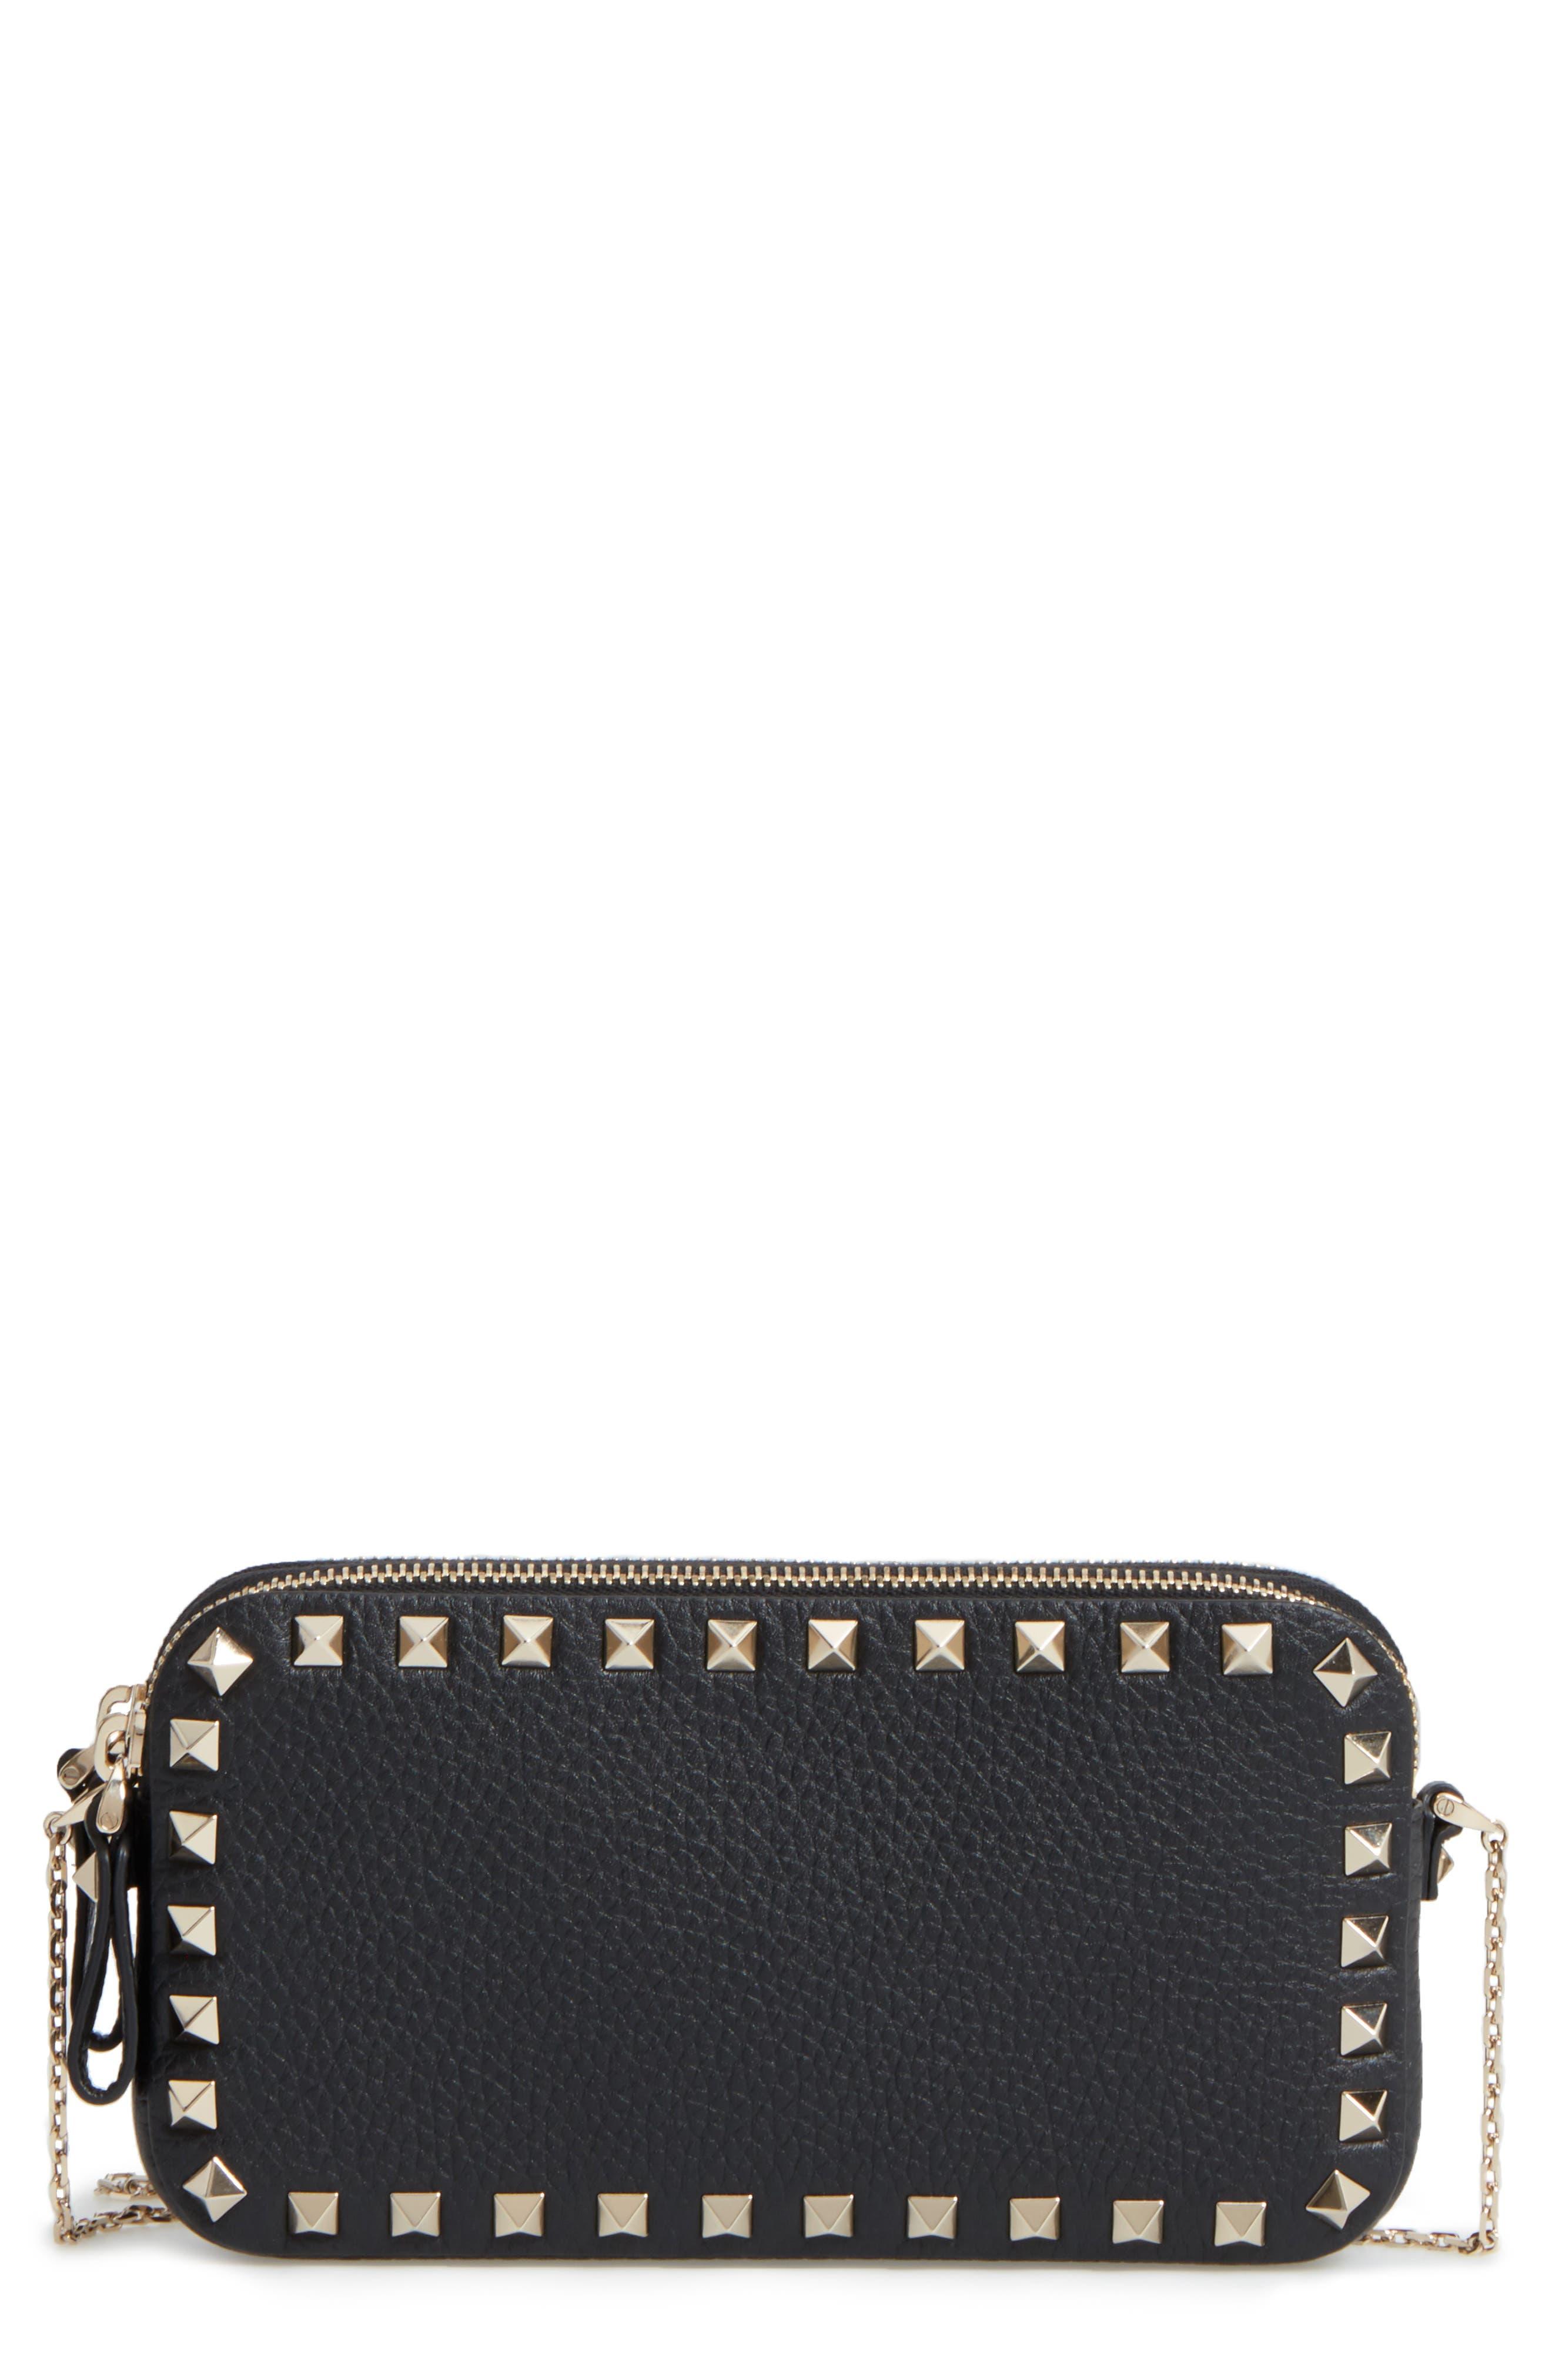 Alternate Image 1 Selected - VALENTINO GARAVANI Rockstud Leather Crossbody Bag